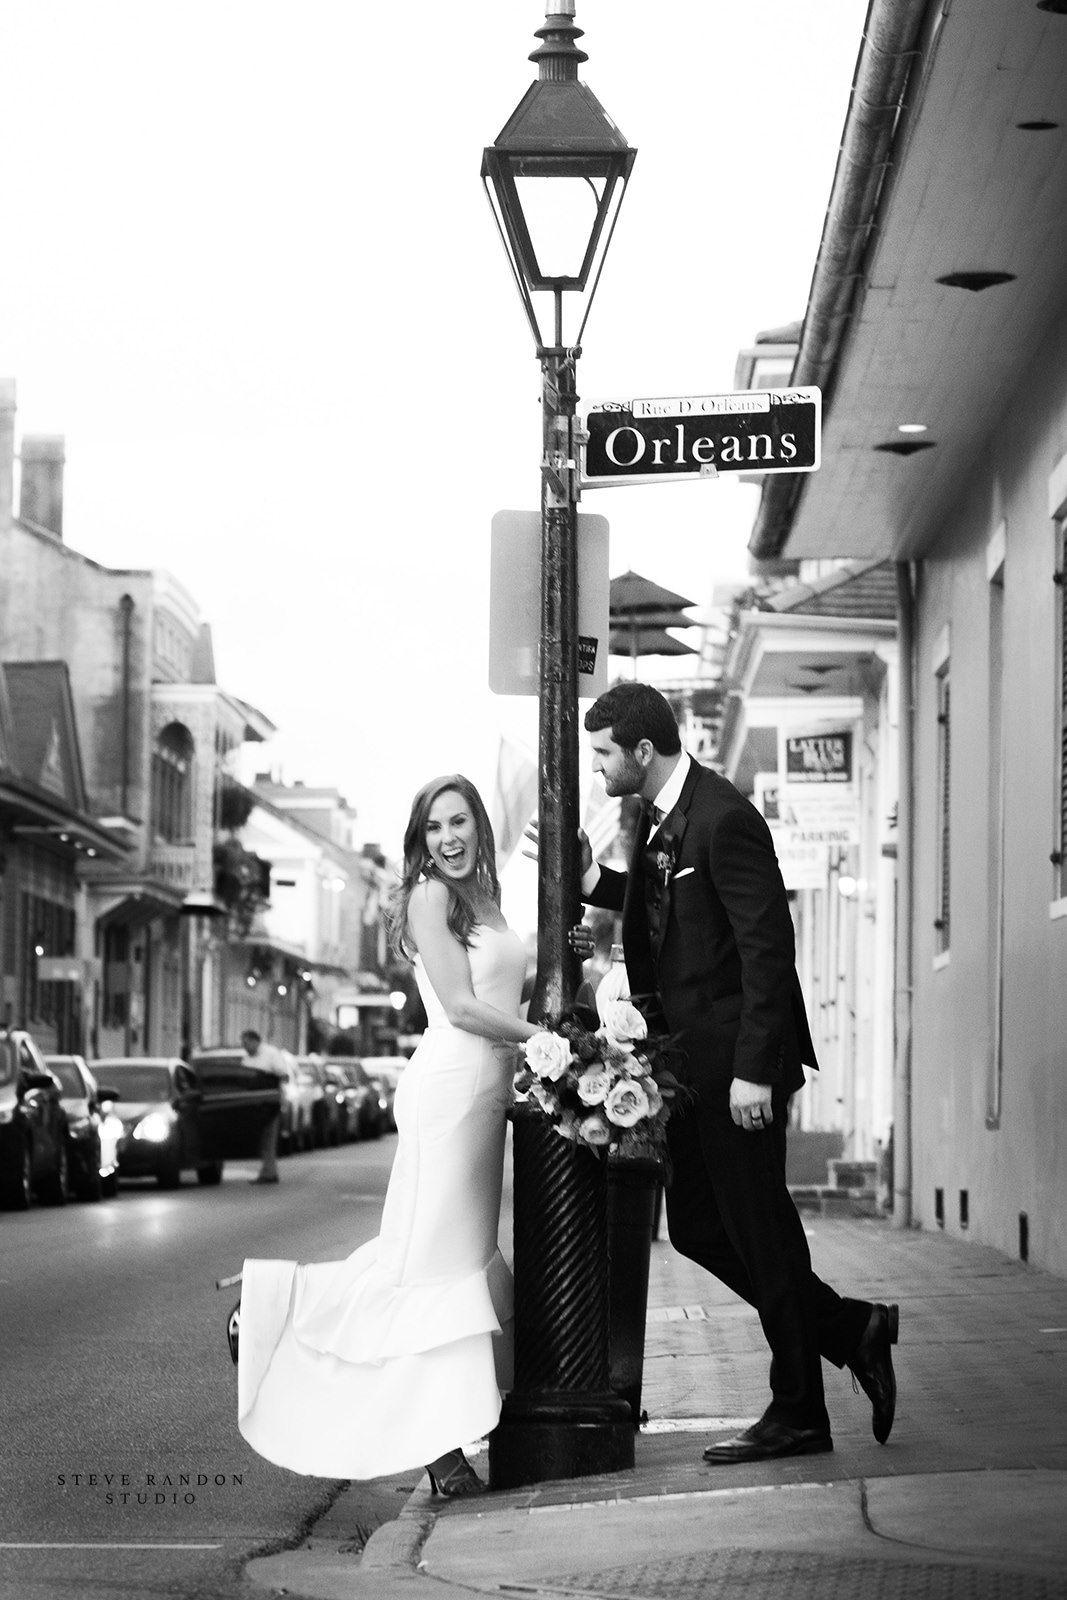 Steve Randon Studio Wedding Photography New Orleans La New Orleans Wedding Wedding Photographers New Orleans